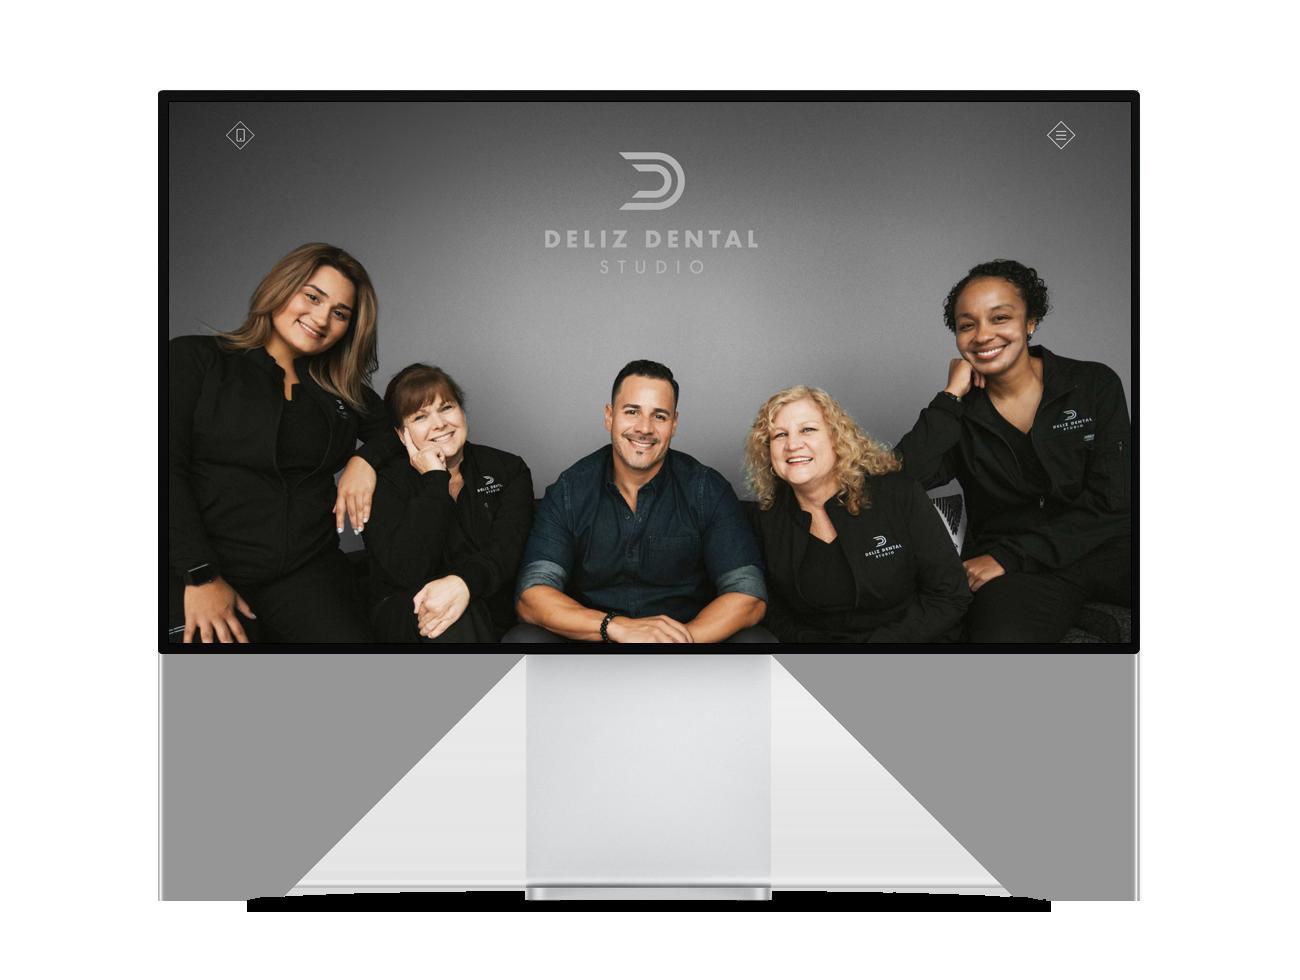 Screenshot of the Deliz Dental Studio homepage